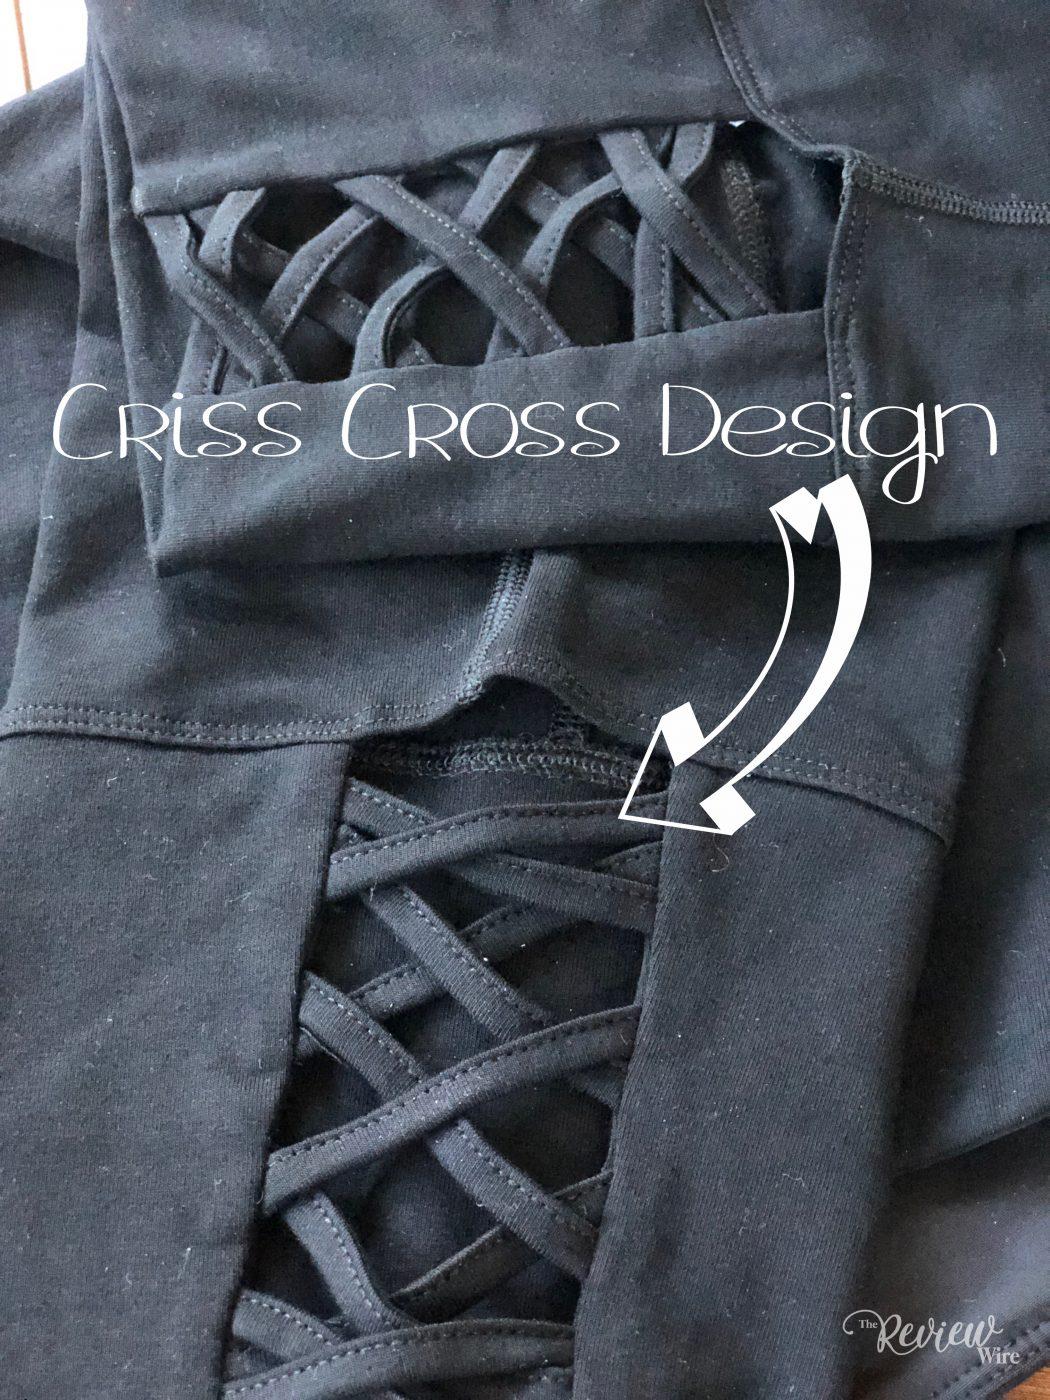 Criss Cross Design in the Ruby Ribbon Capri Leggings